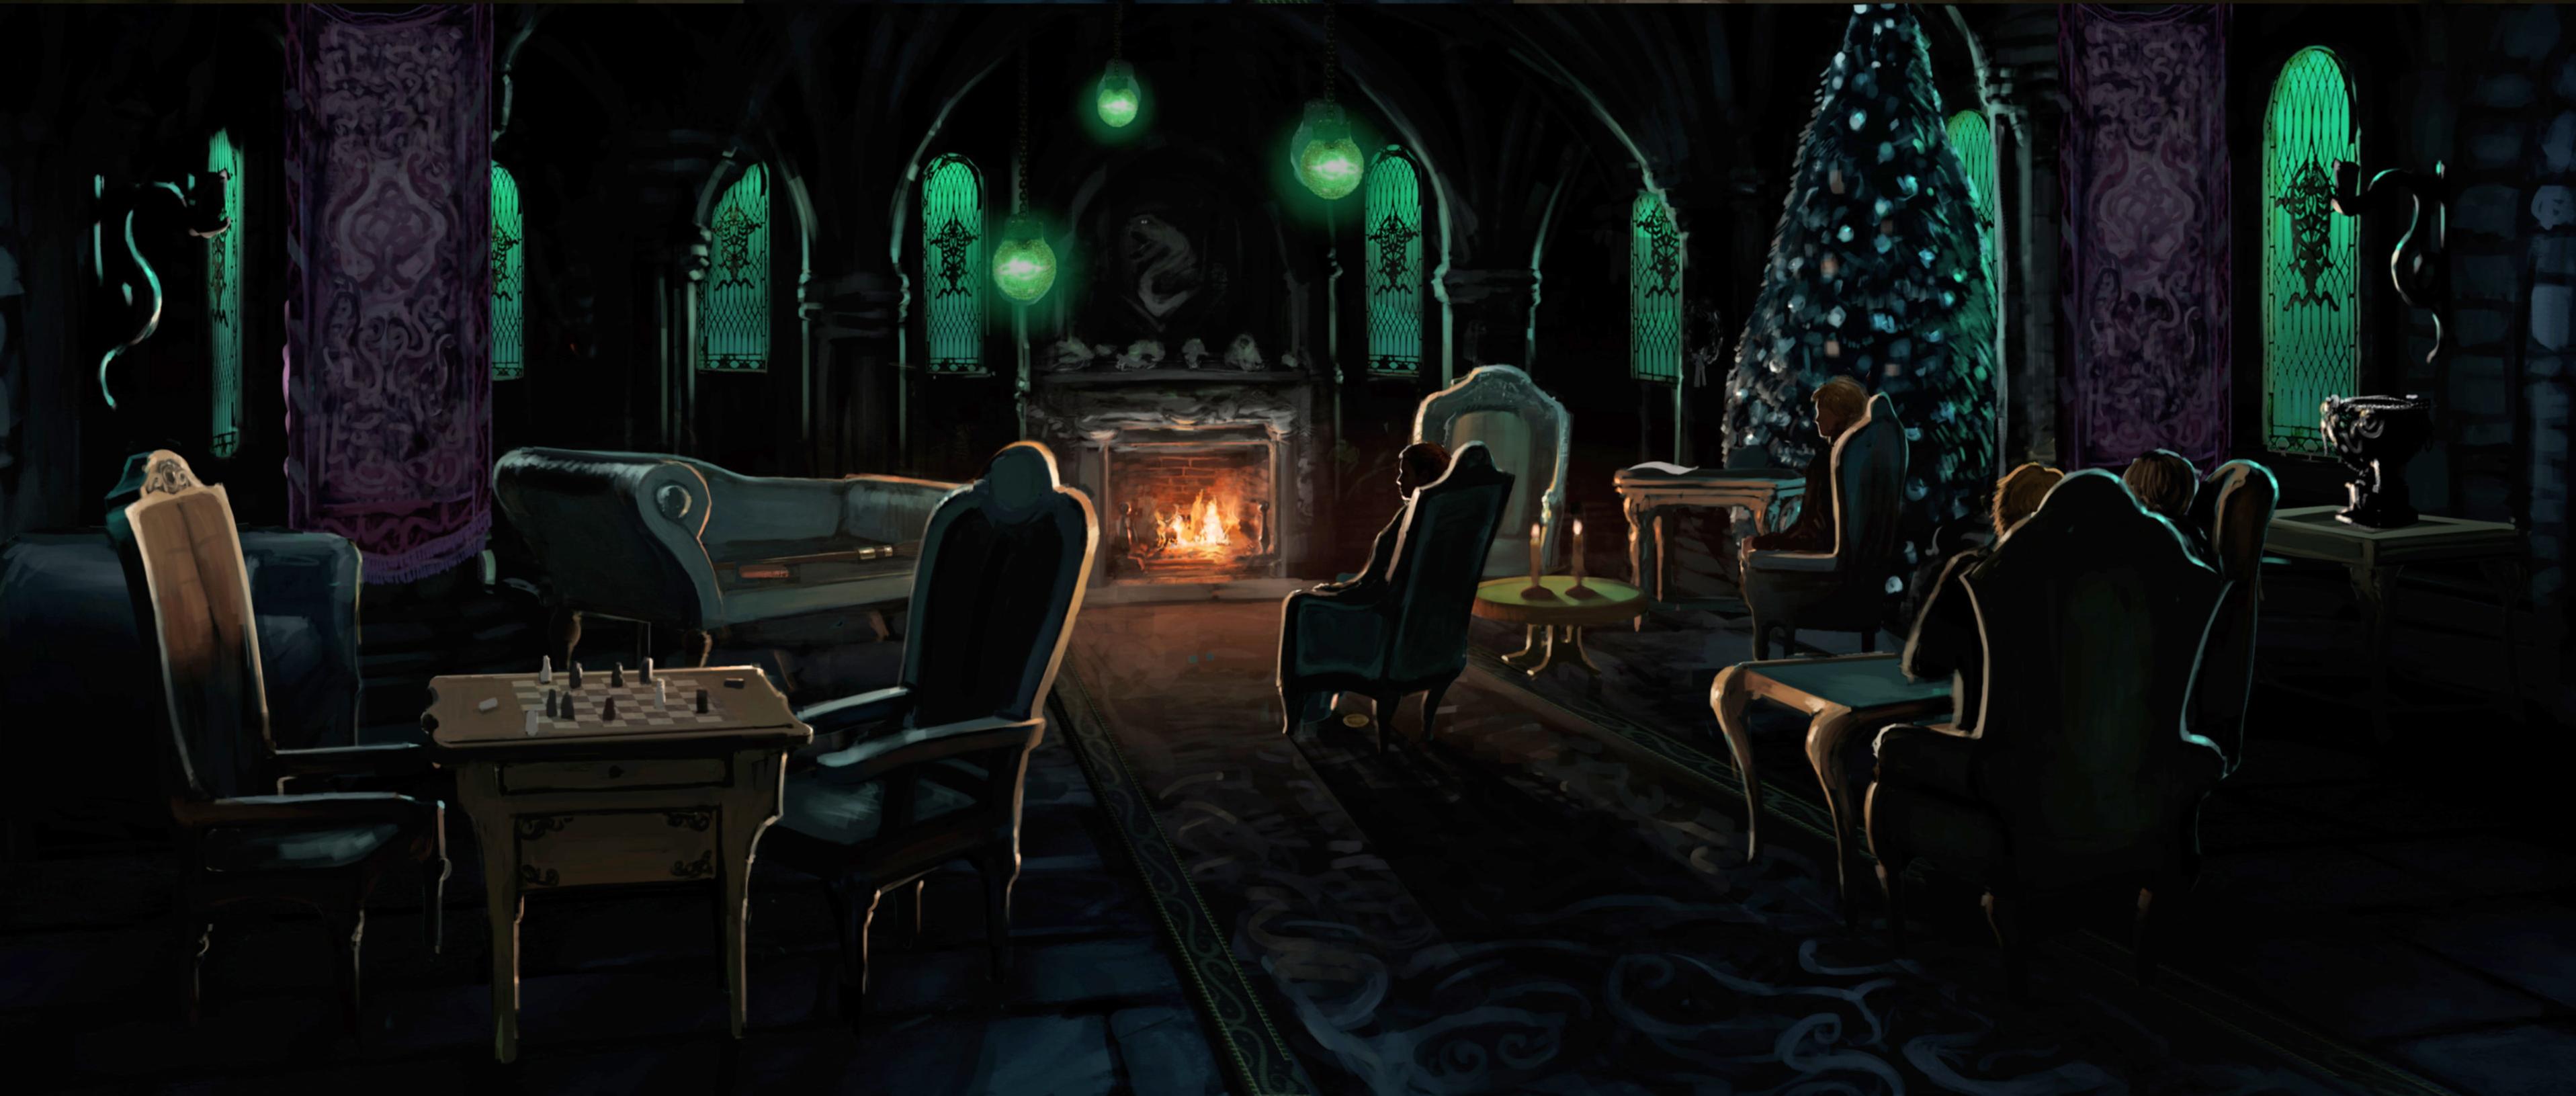 Good Wallpaper Harry Potter Pottermore - latest?cb\u003d20161207074723  2018_772450.png/revision/latest?cb\u003d20161207074723